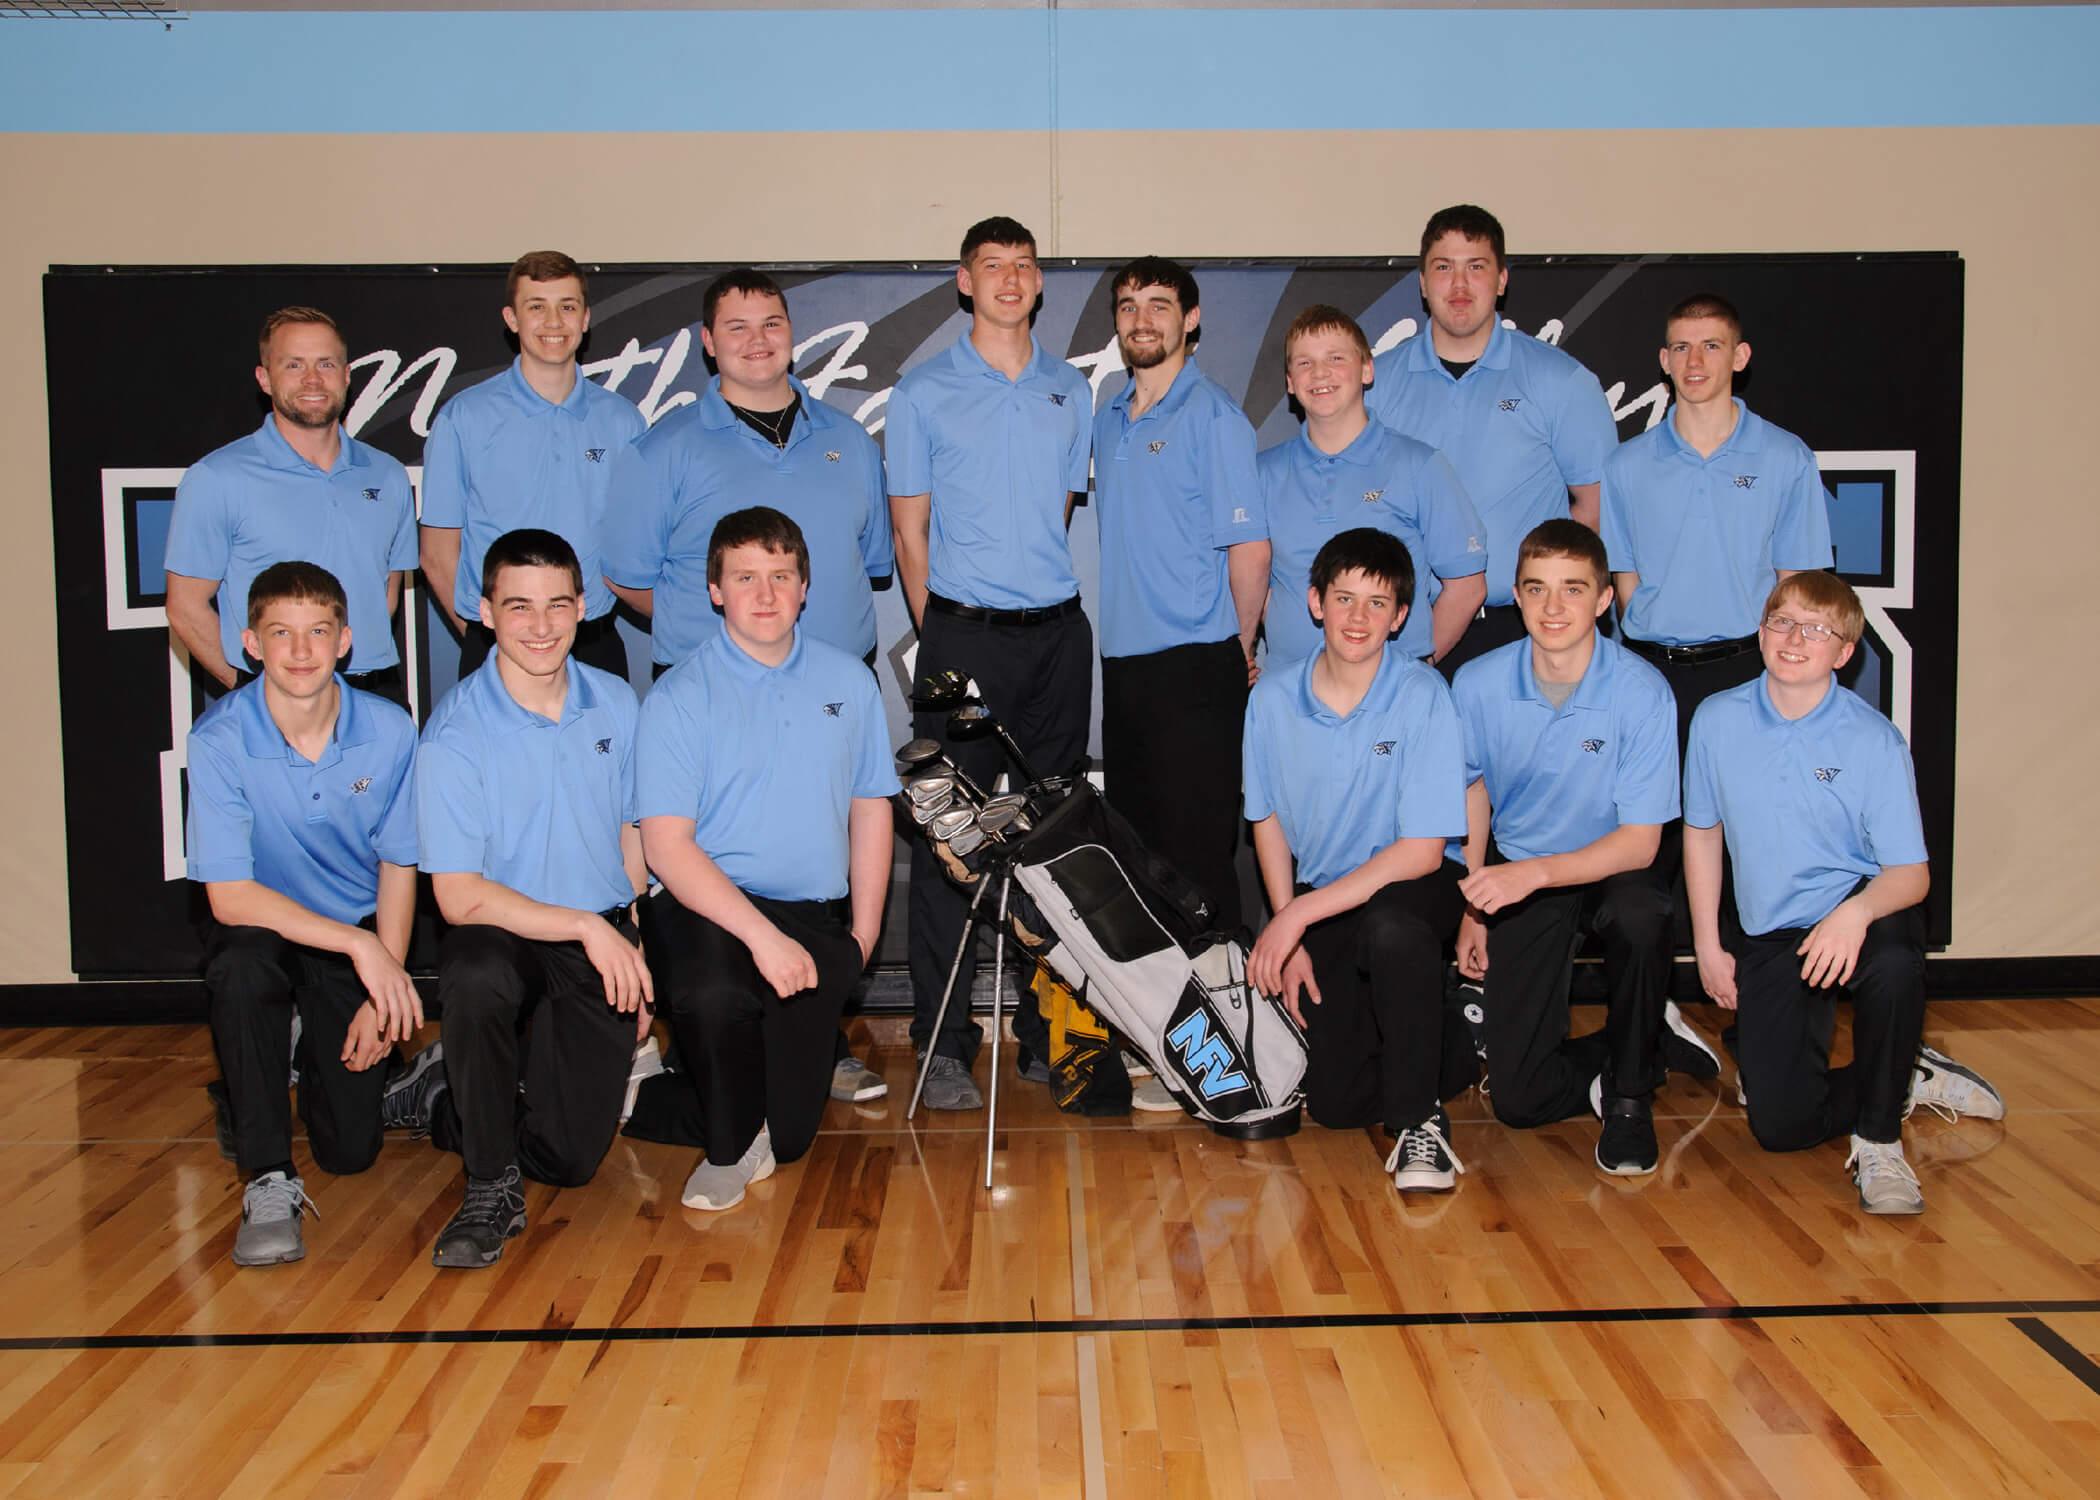 NFV High School Girls Boys 2018 Team Photograph